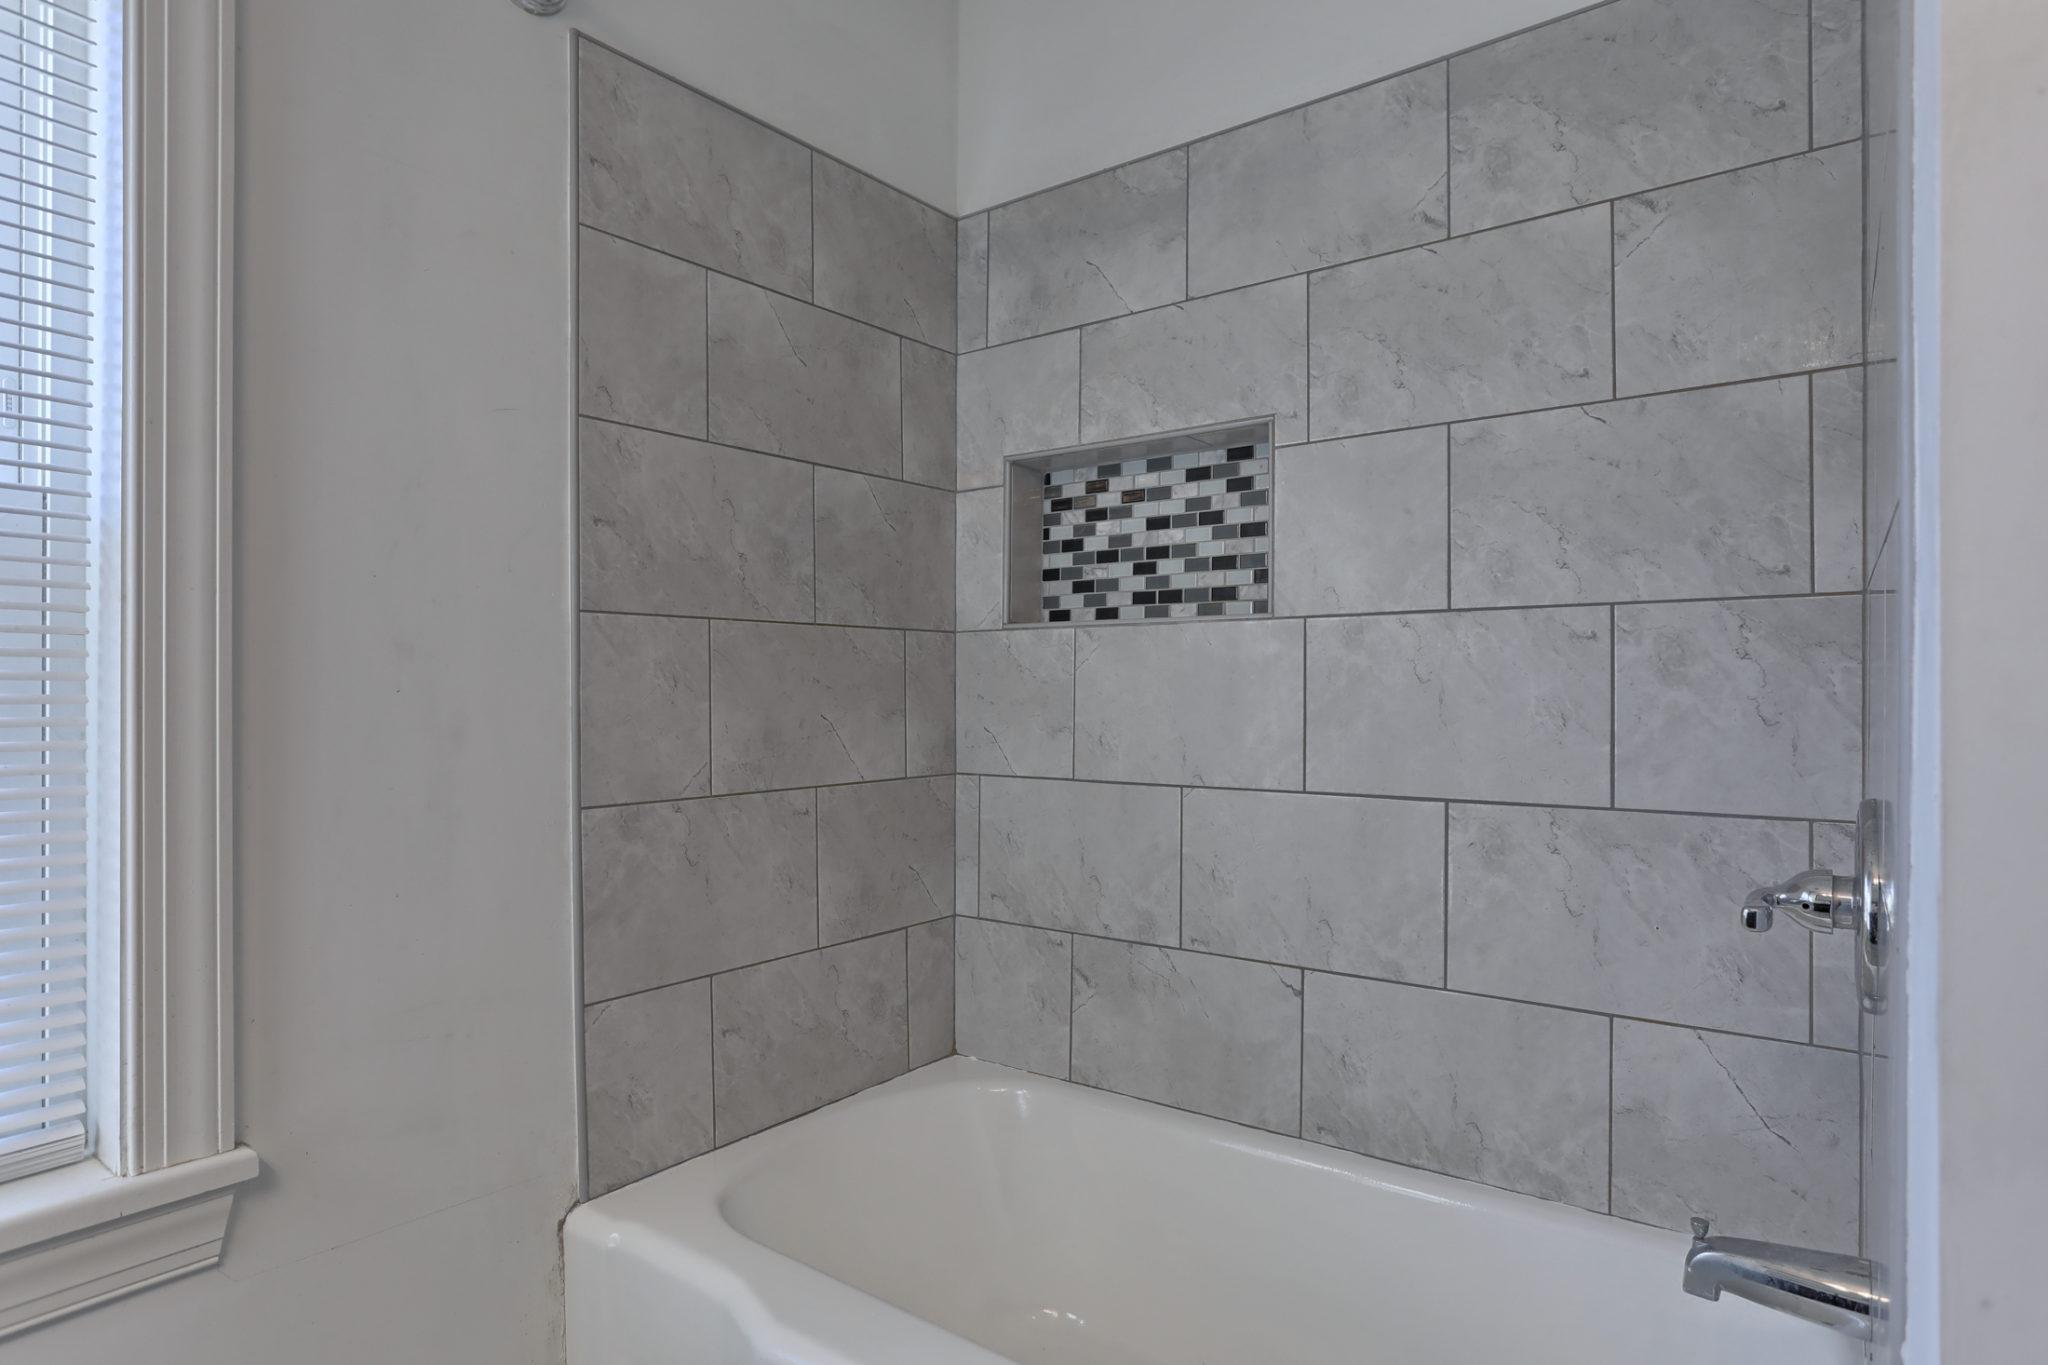 12 E. Center Ave. - Bathroom 2